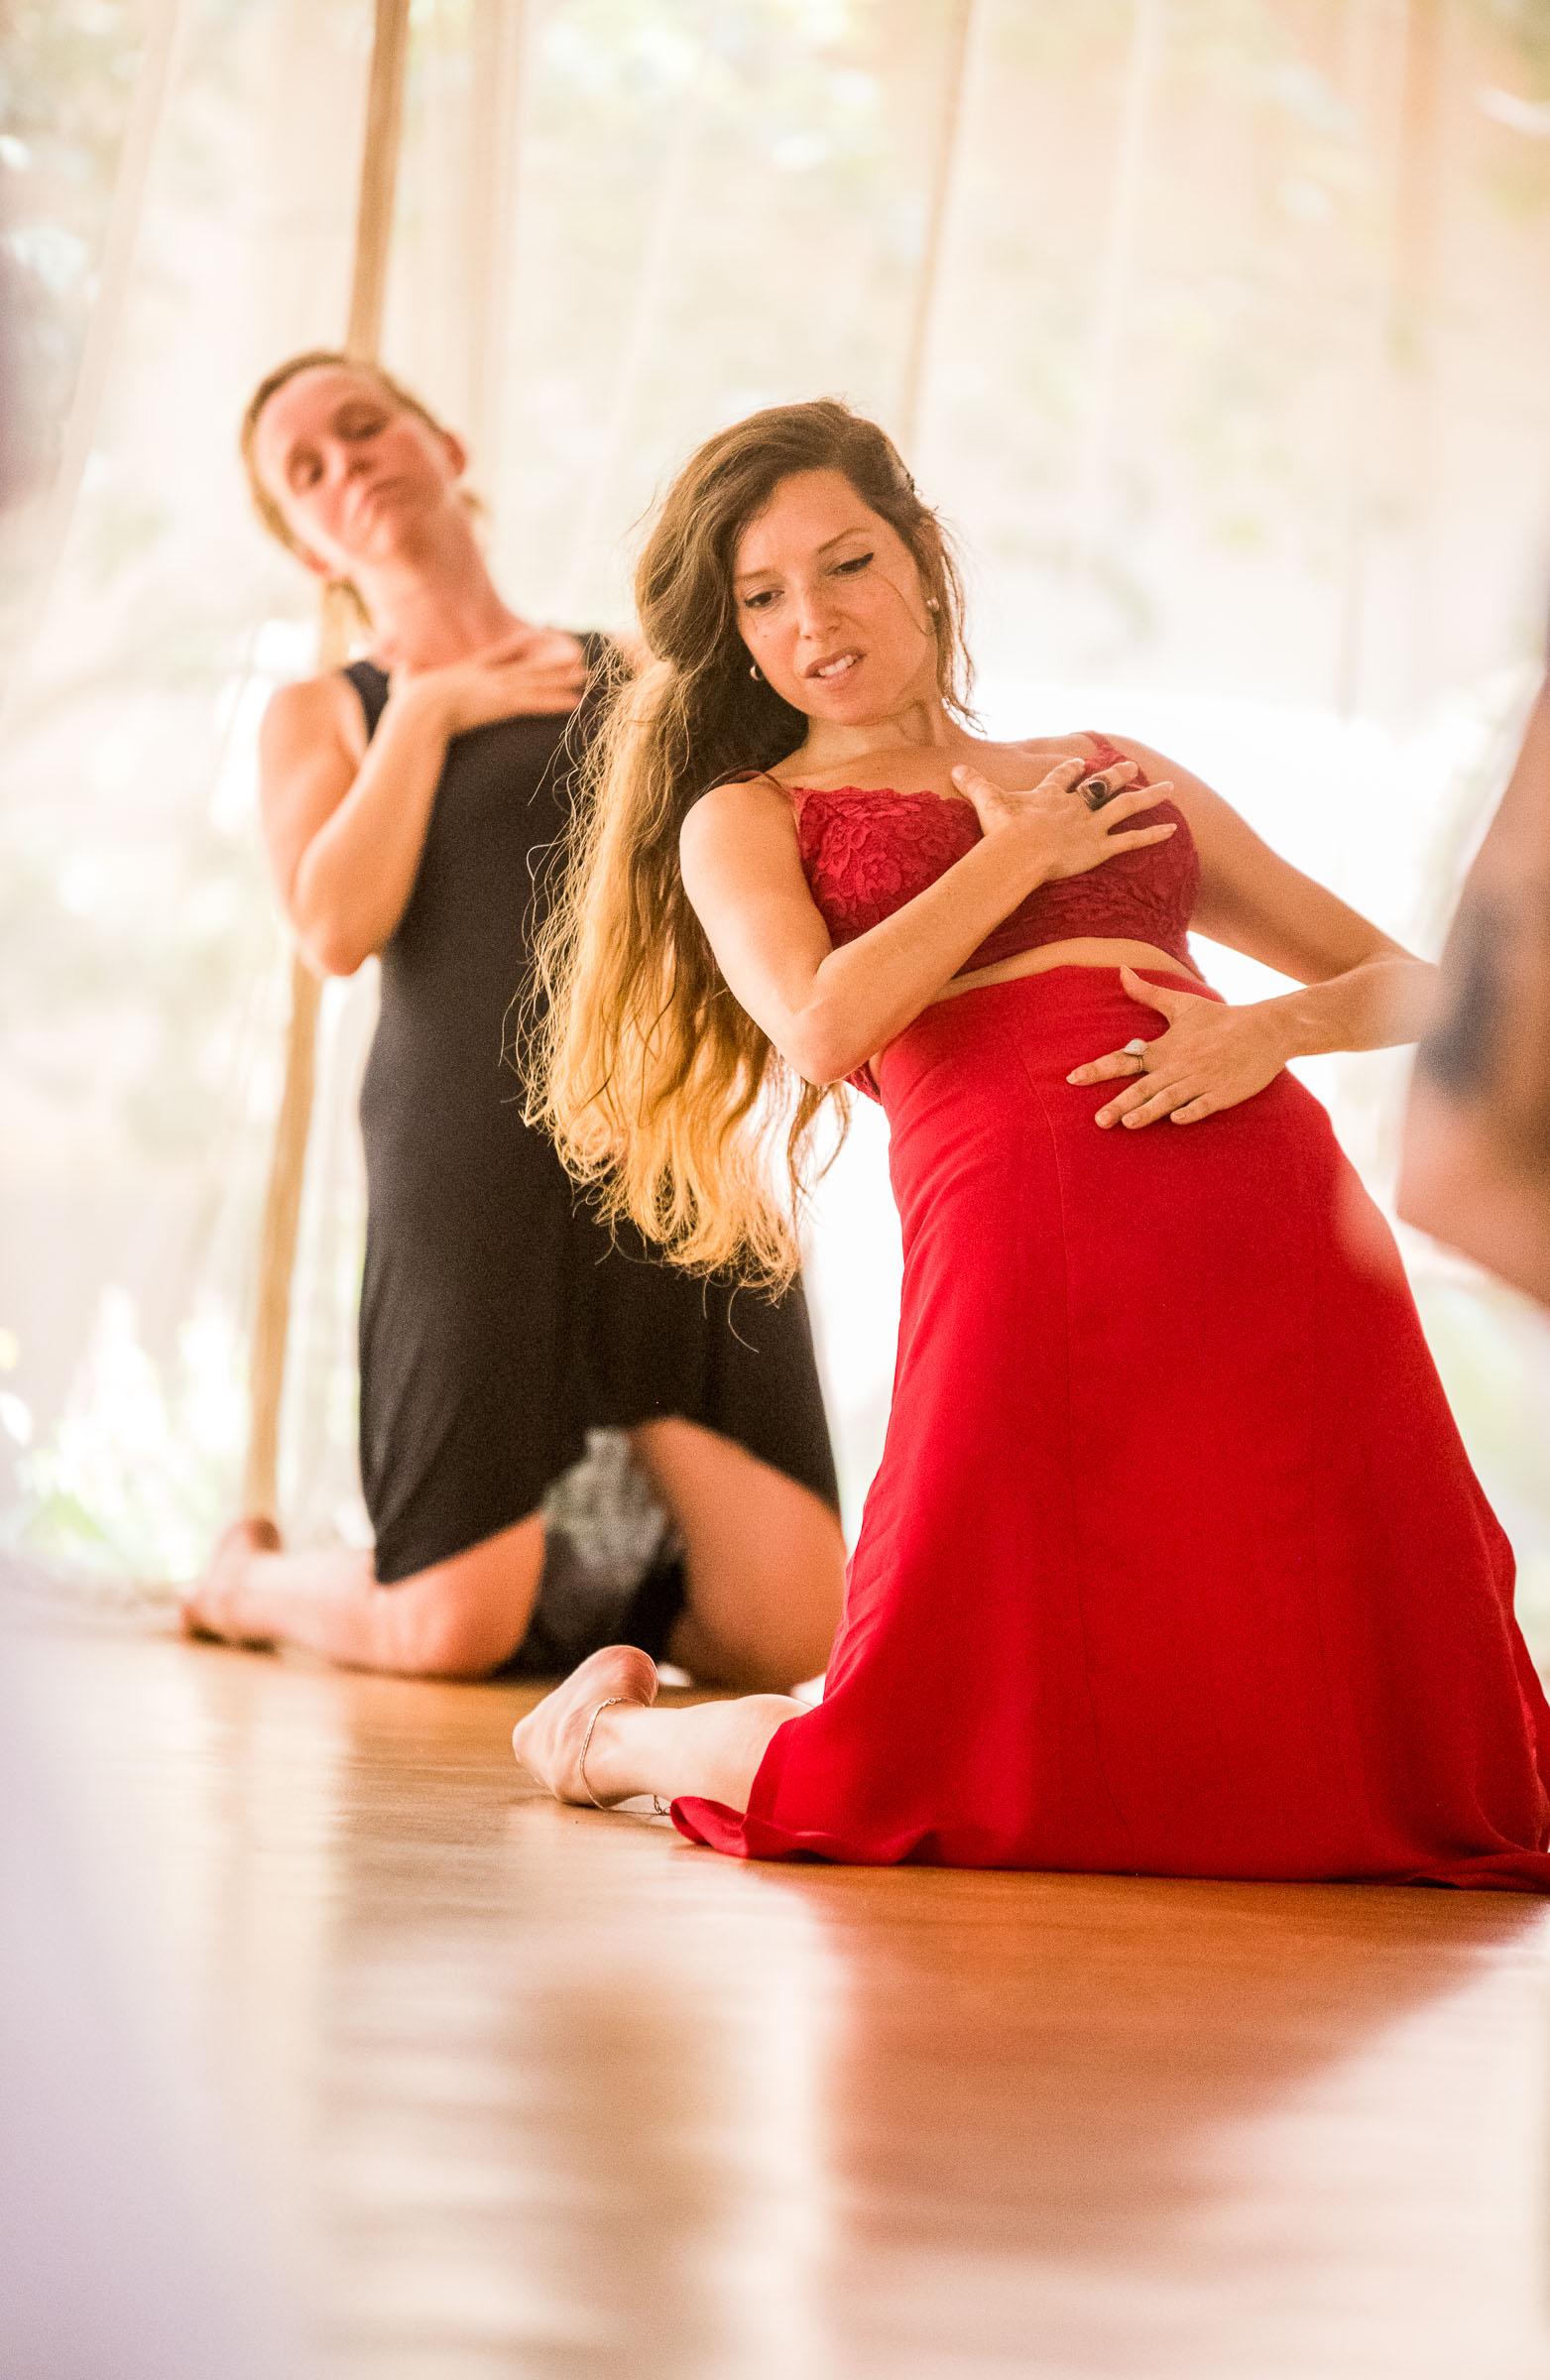 Dance Portrait of an international dancer and retreat organiser captured by Magdalena Smolarska Photography